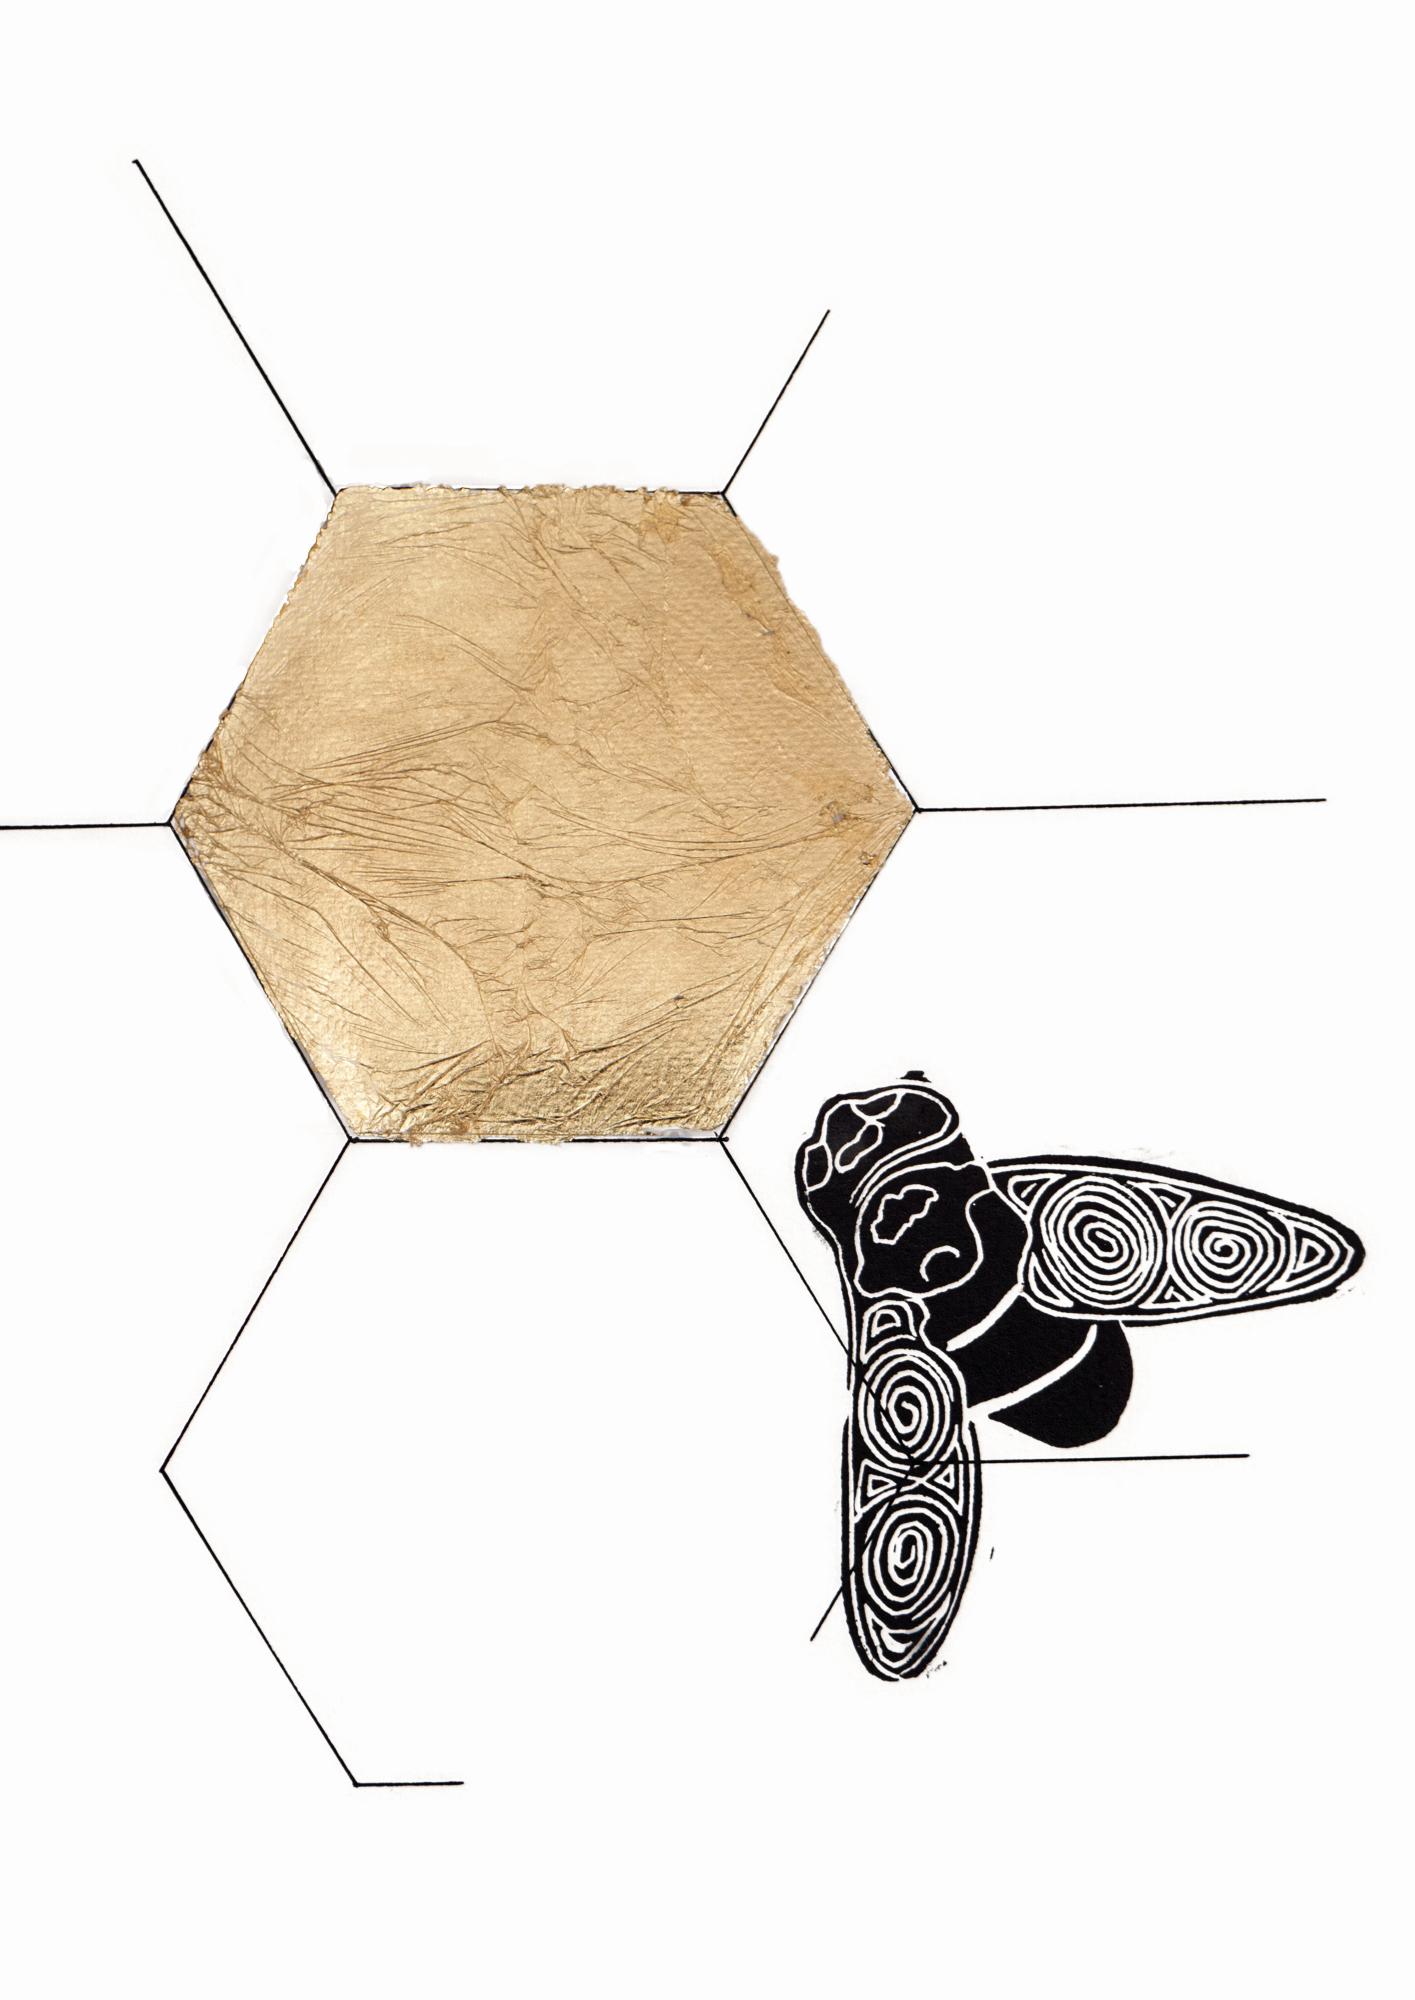 eigen stempels Mixed media insecten druk